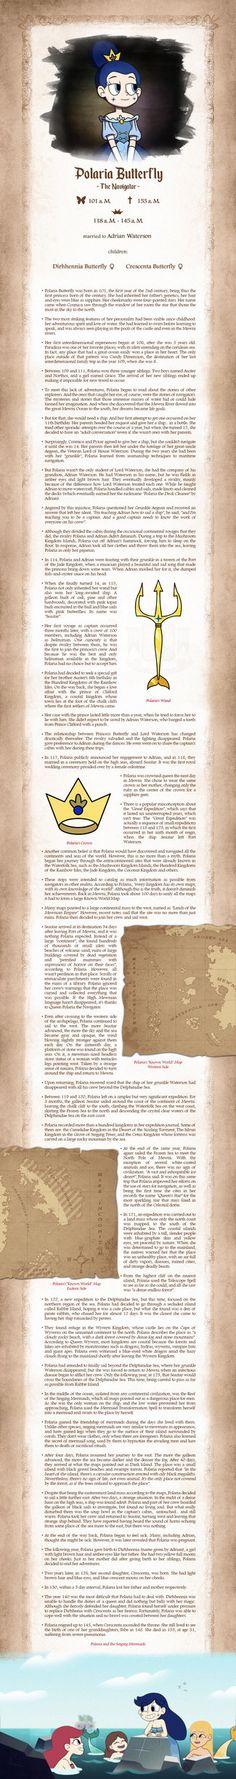 Polaria the Navigator - Biography by jgss0109